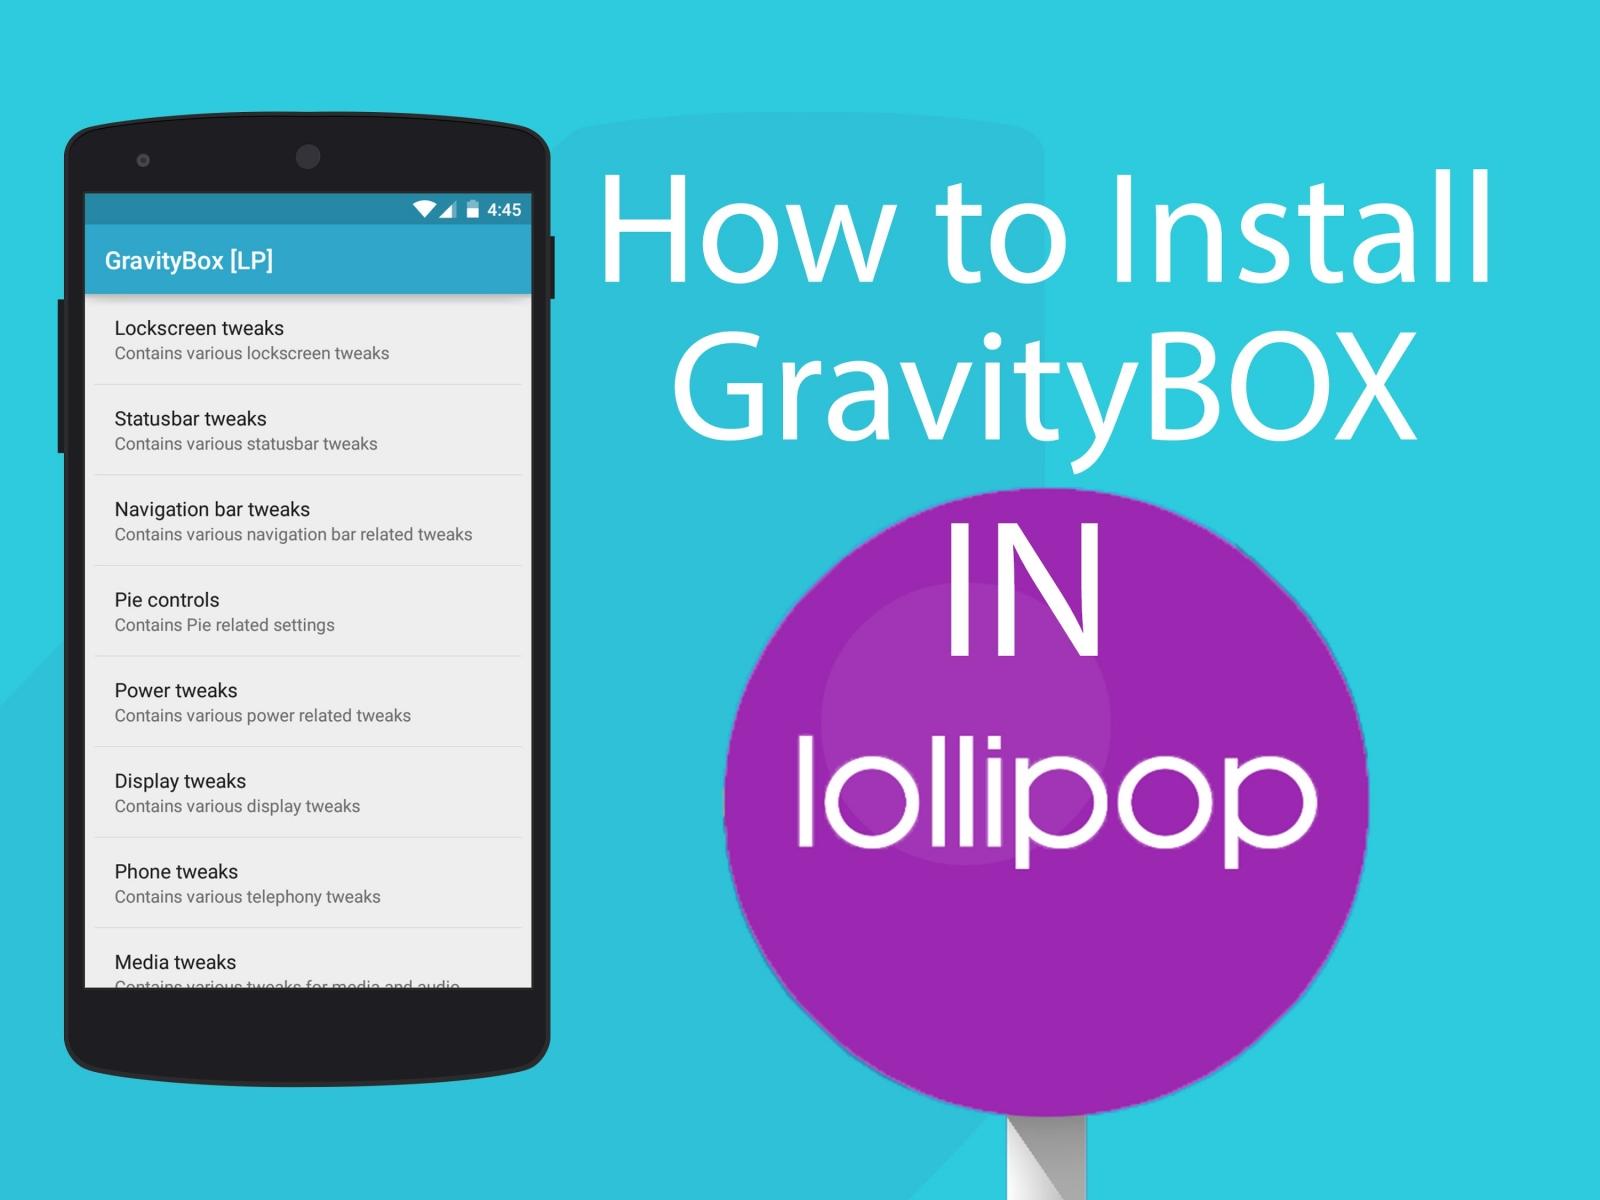 GravityBox module for Xposed Framework